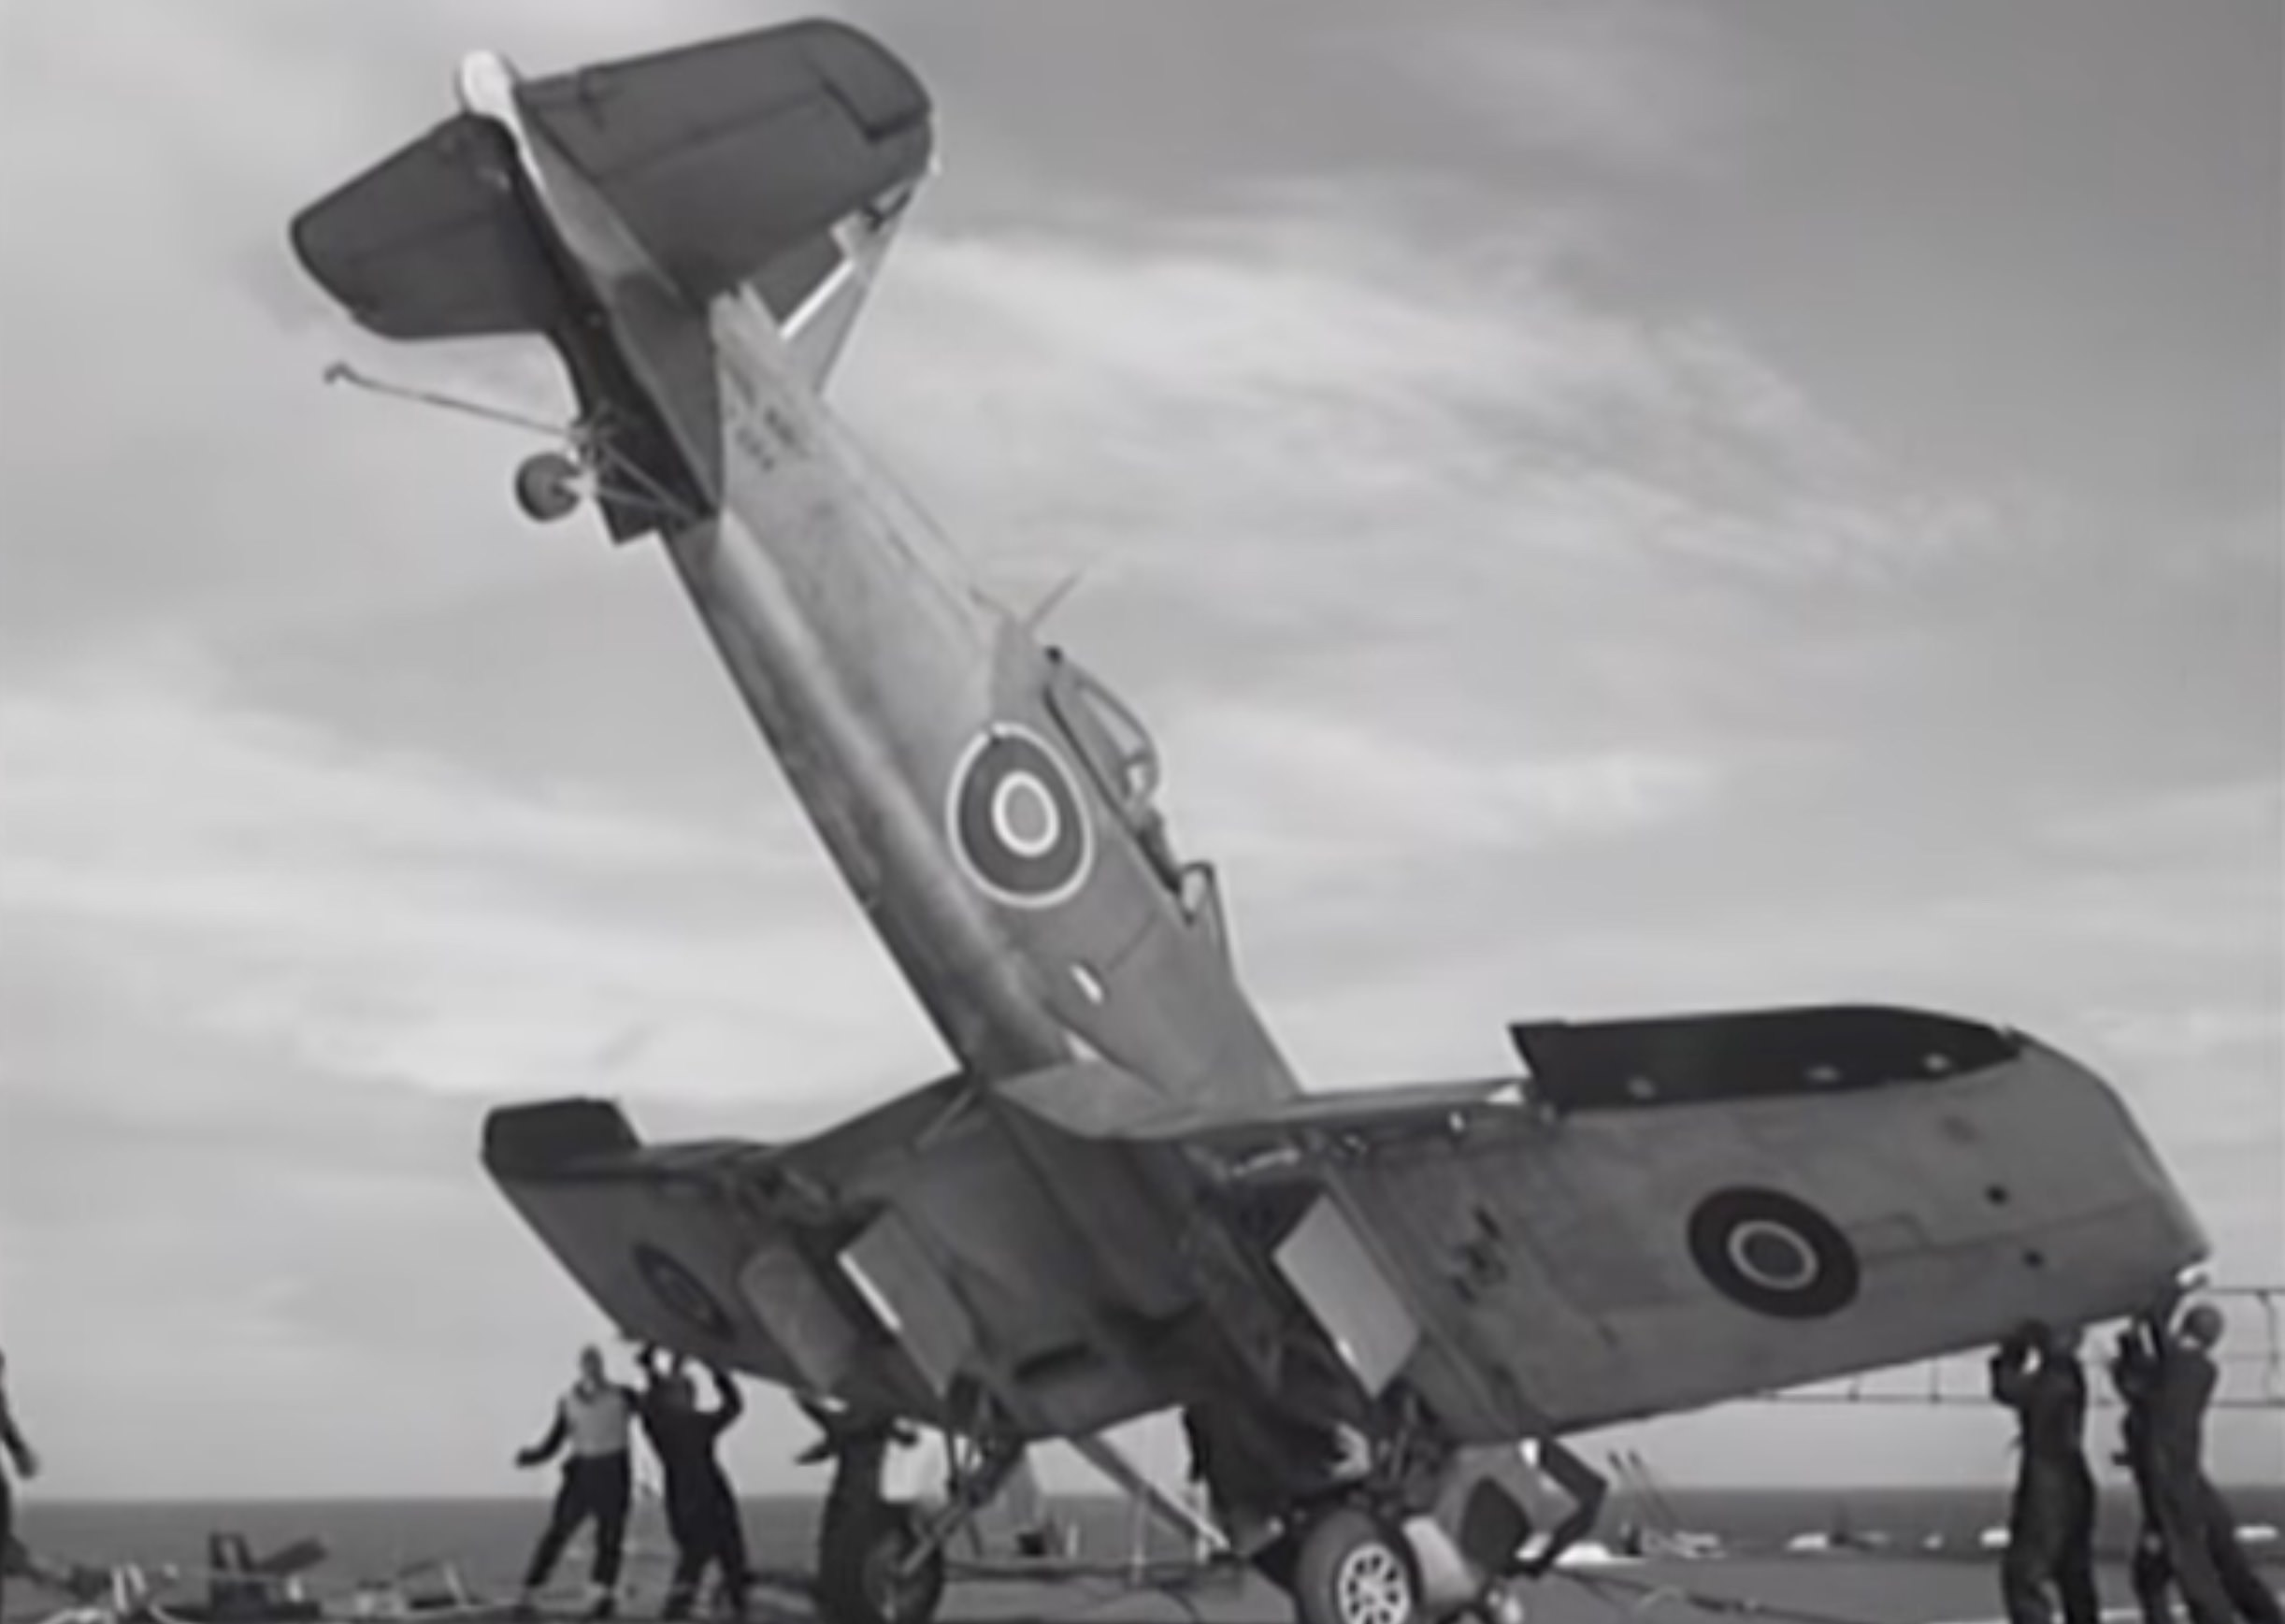 Corvair Crash WW2 Aircraft Carrier